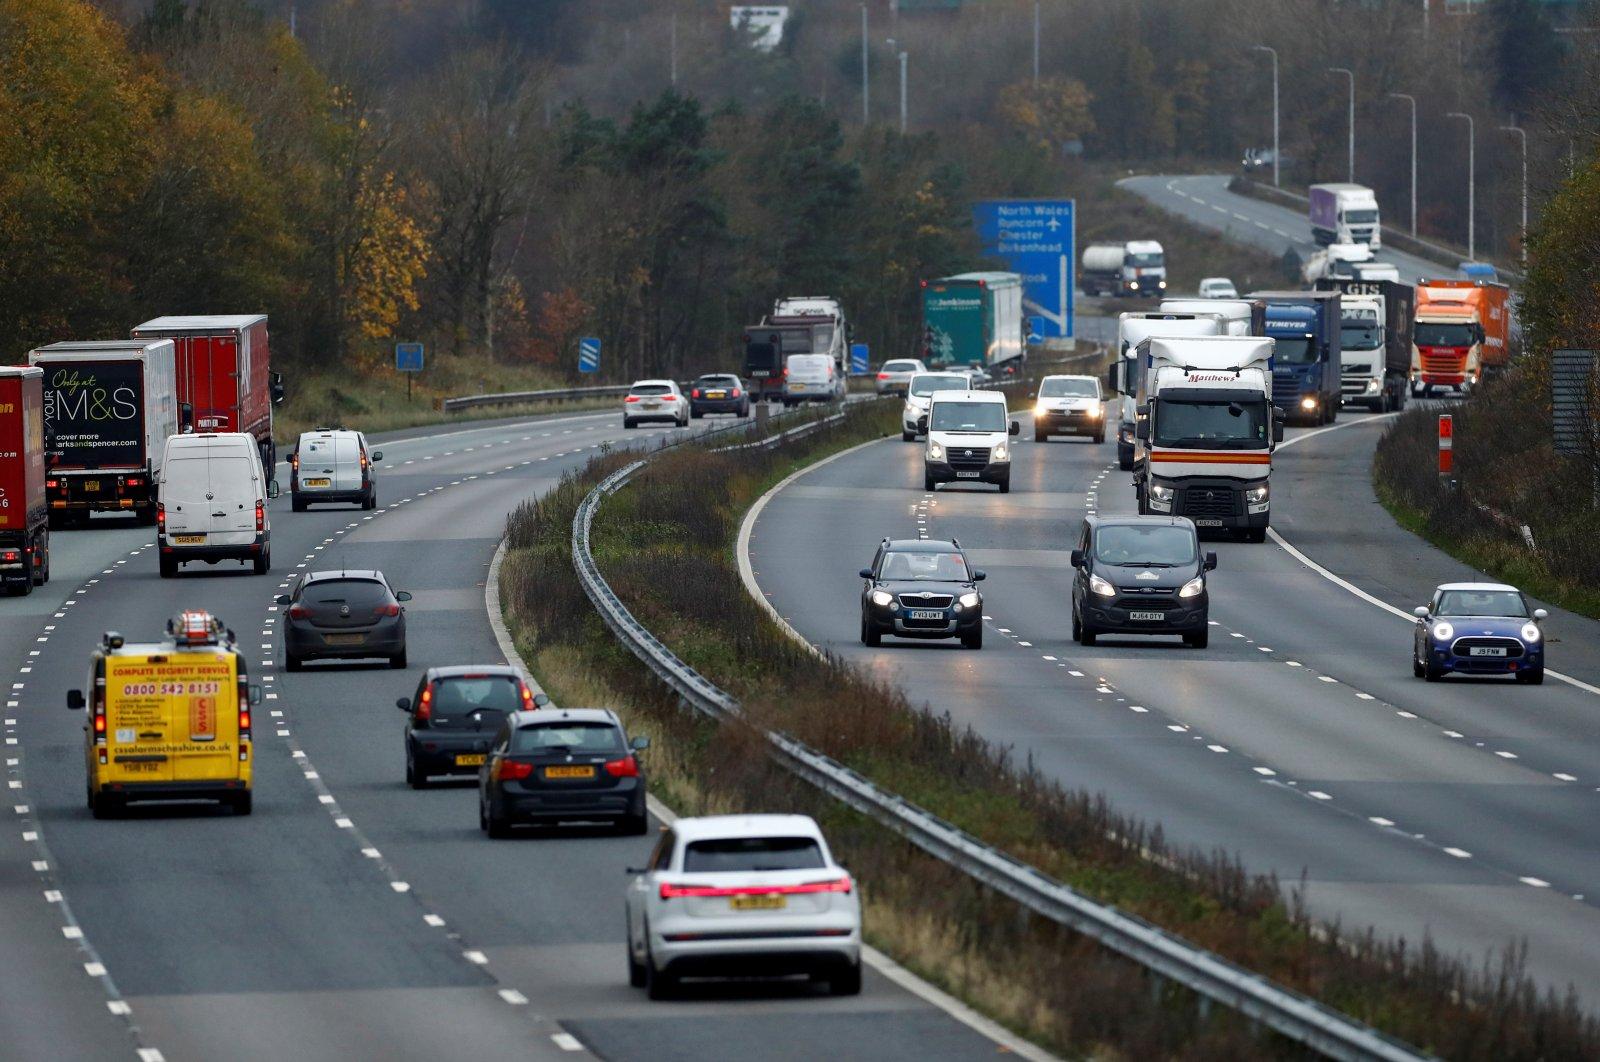 Vehicles on the M56 near Daresbury, in Cheshire, the U.K., Nov. 18, 2020. (Reuters Photo)